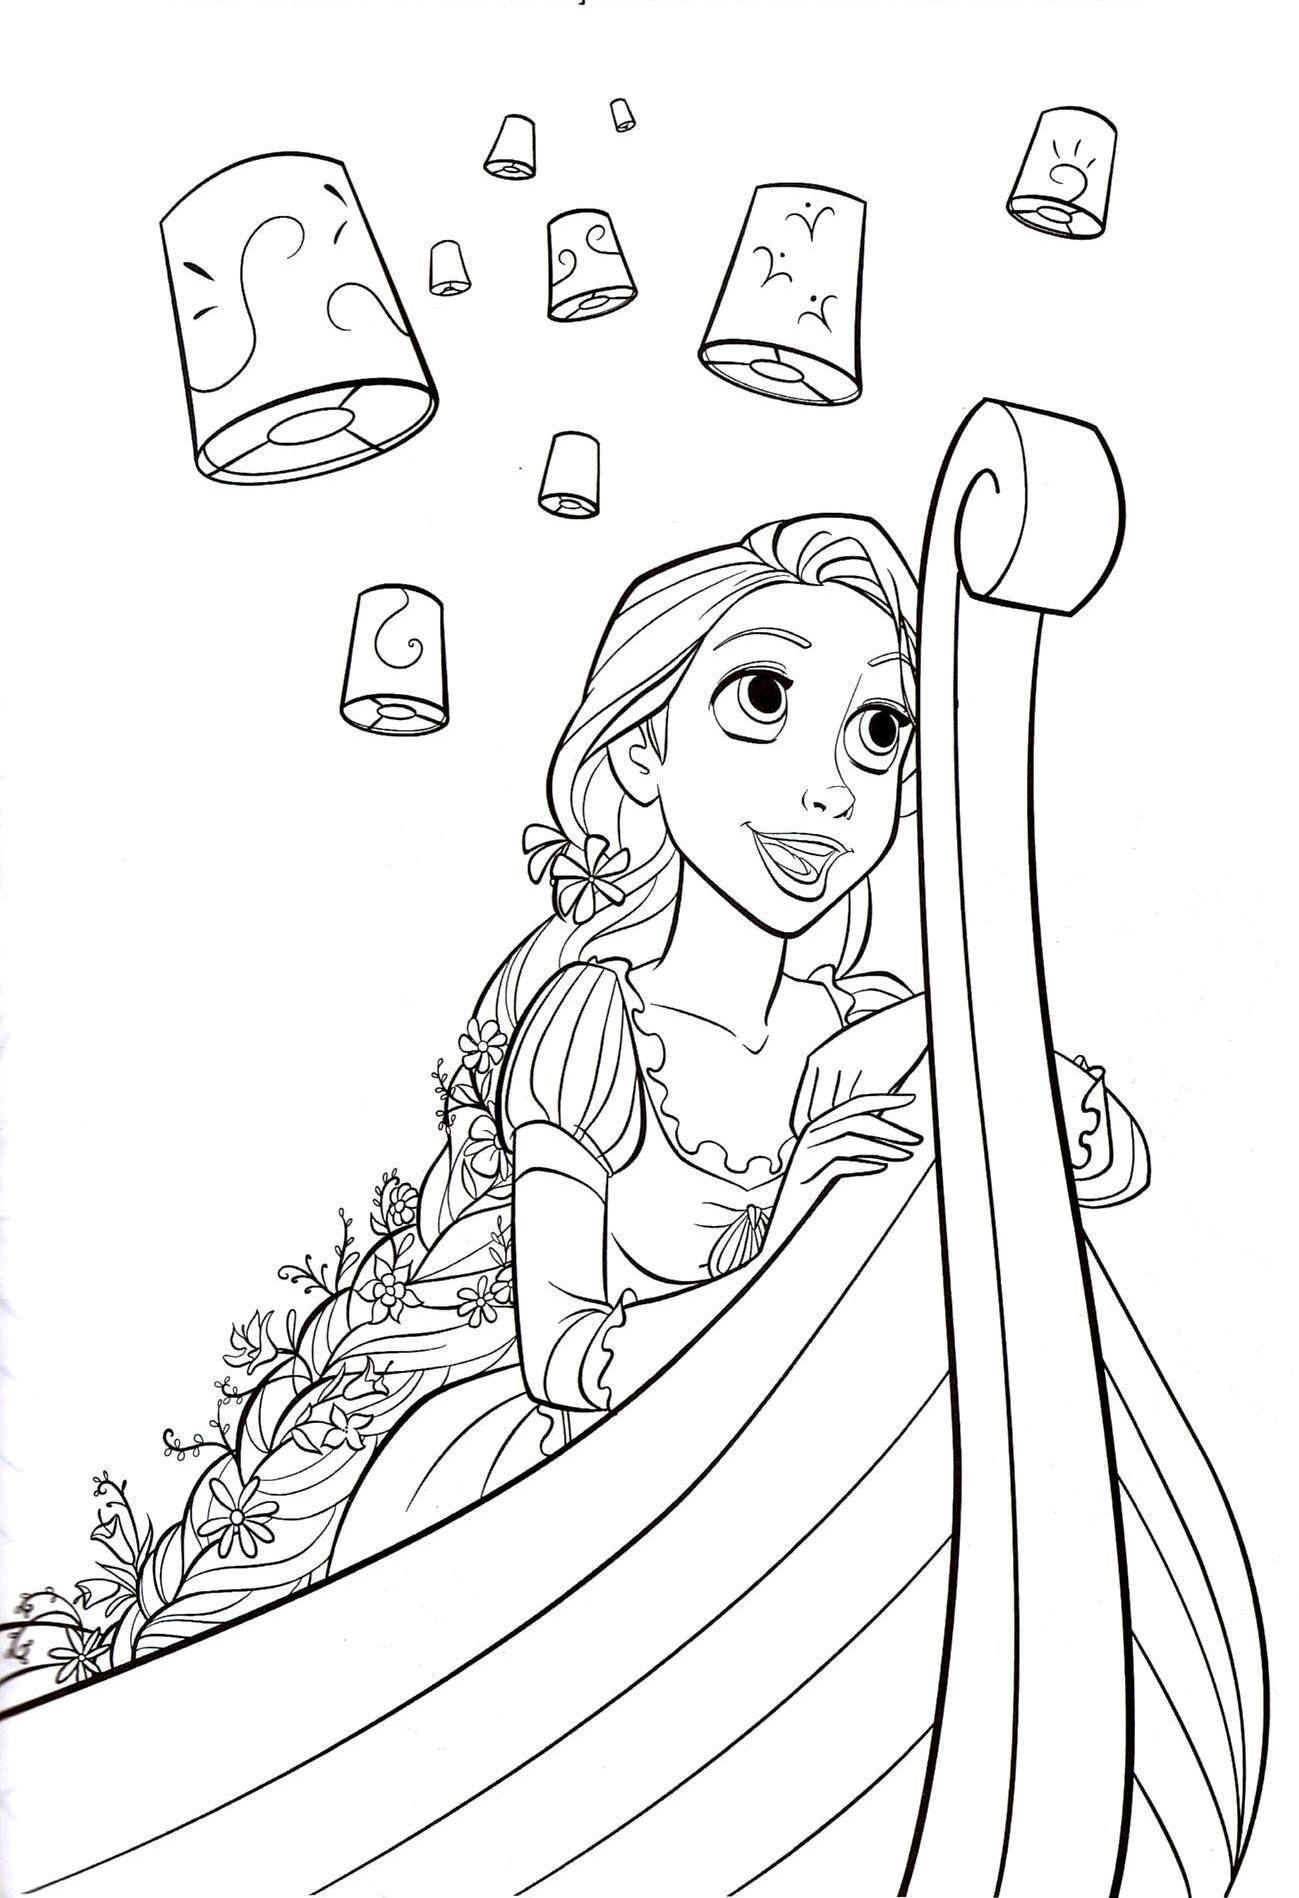 Disney Rapunzel Coloring Pages Free Printable Disney Princess - Free Printable Tangled